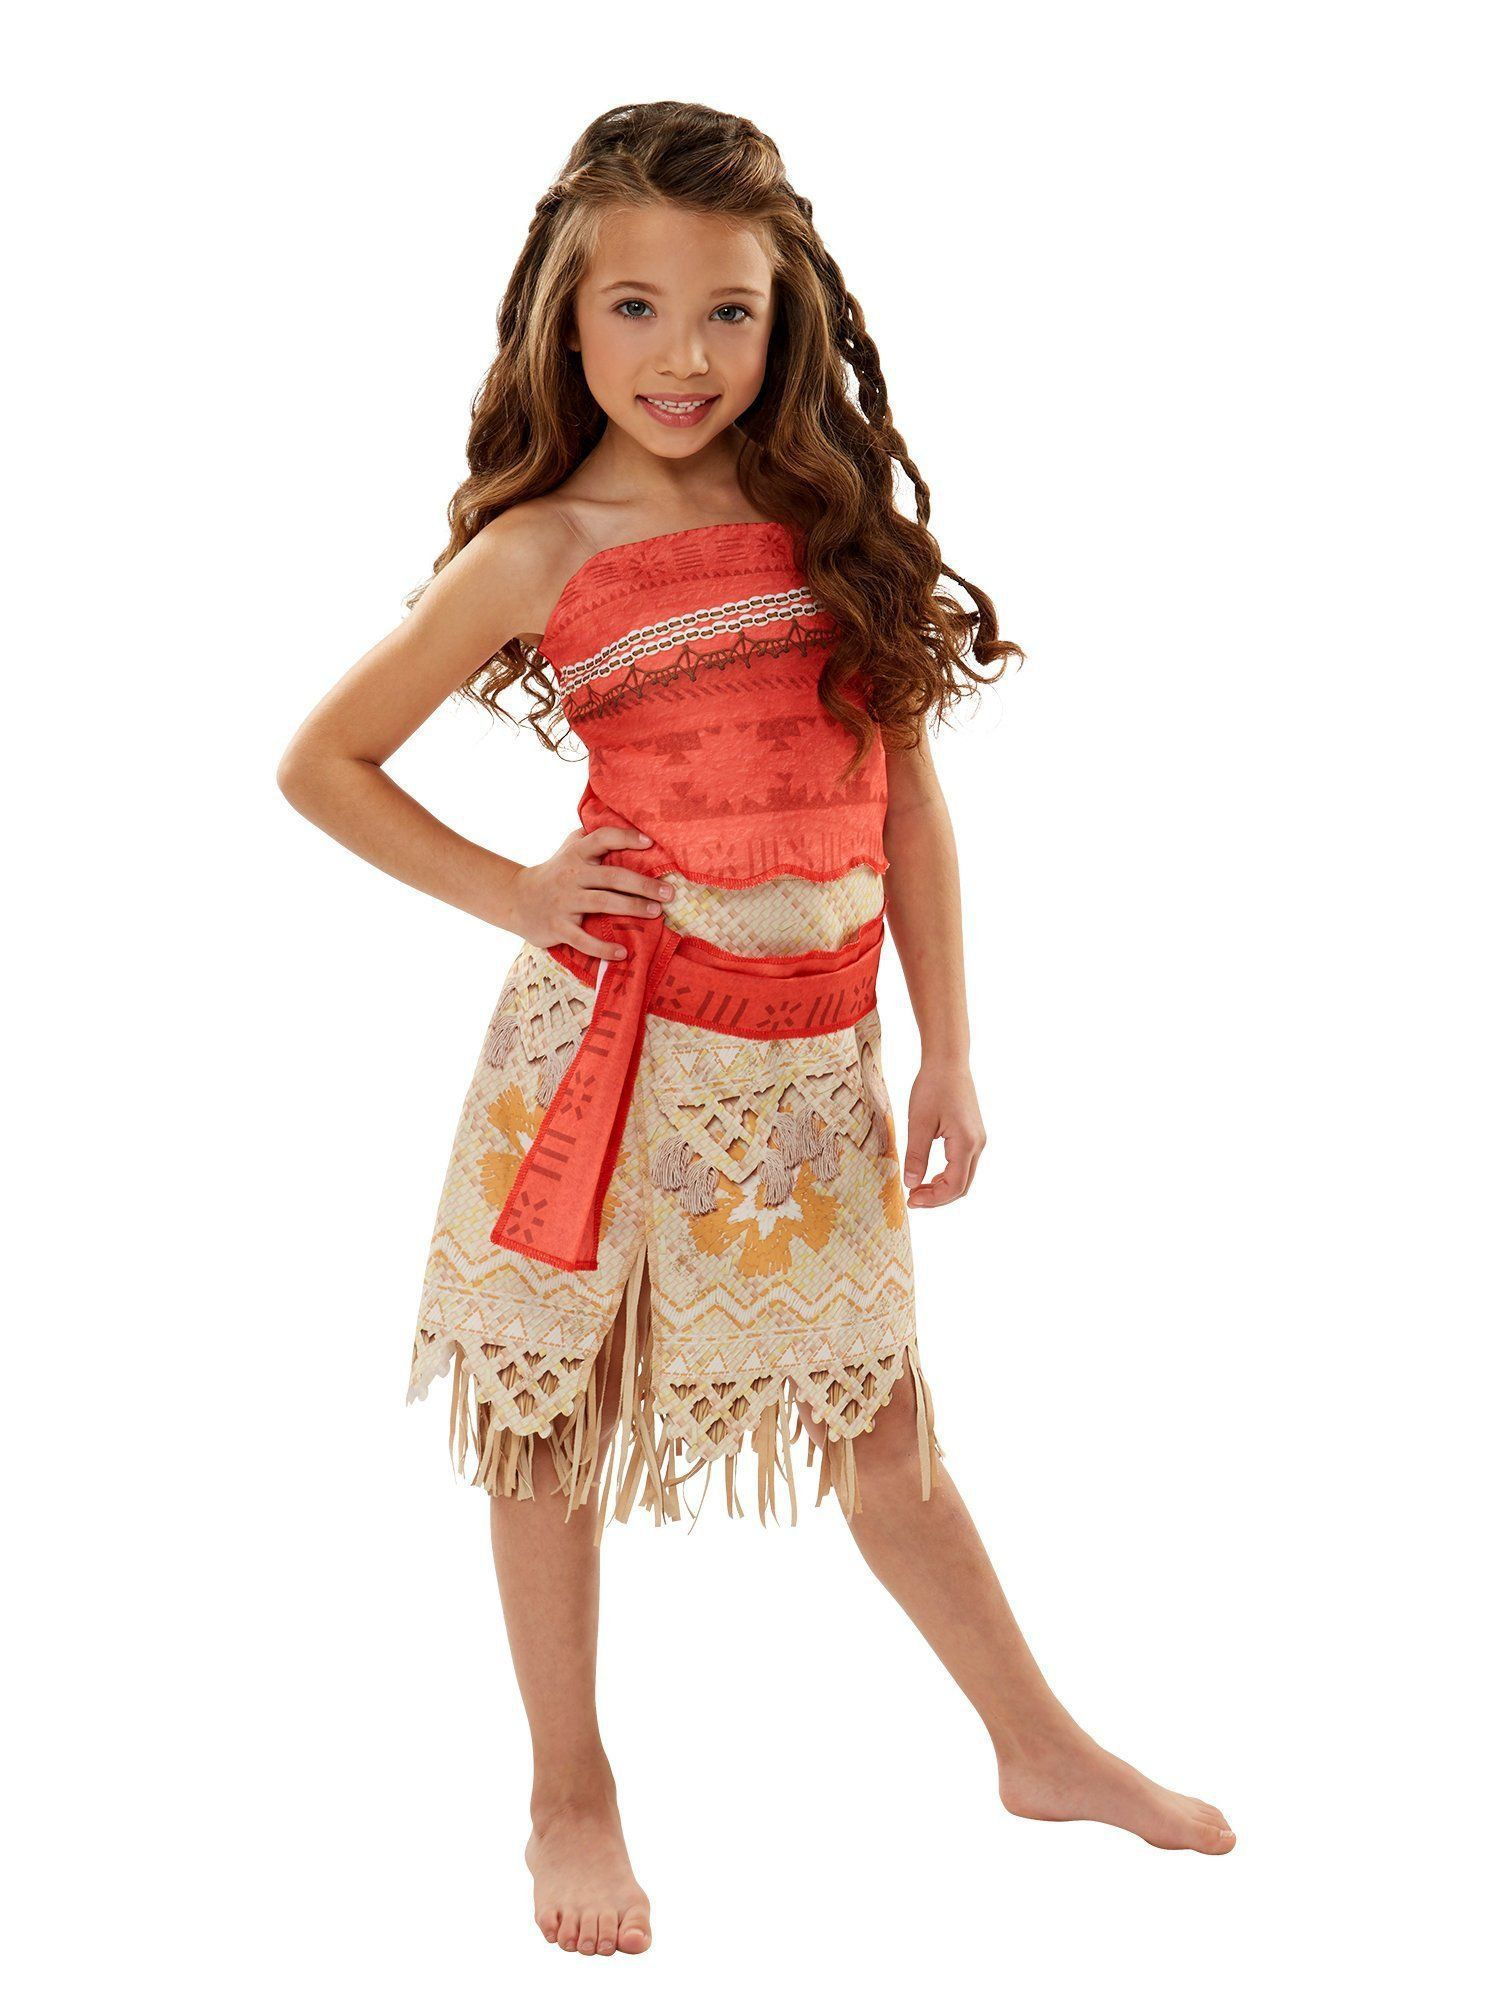 Fantasia Infantil Feminino Moana: Disney (Apenas Venda Online)